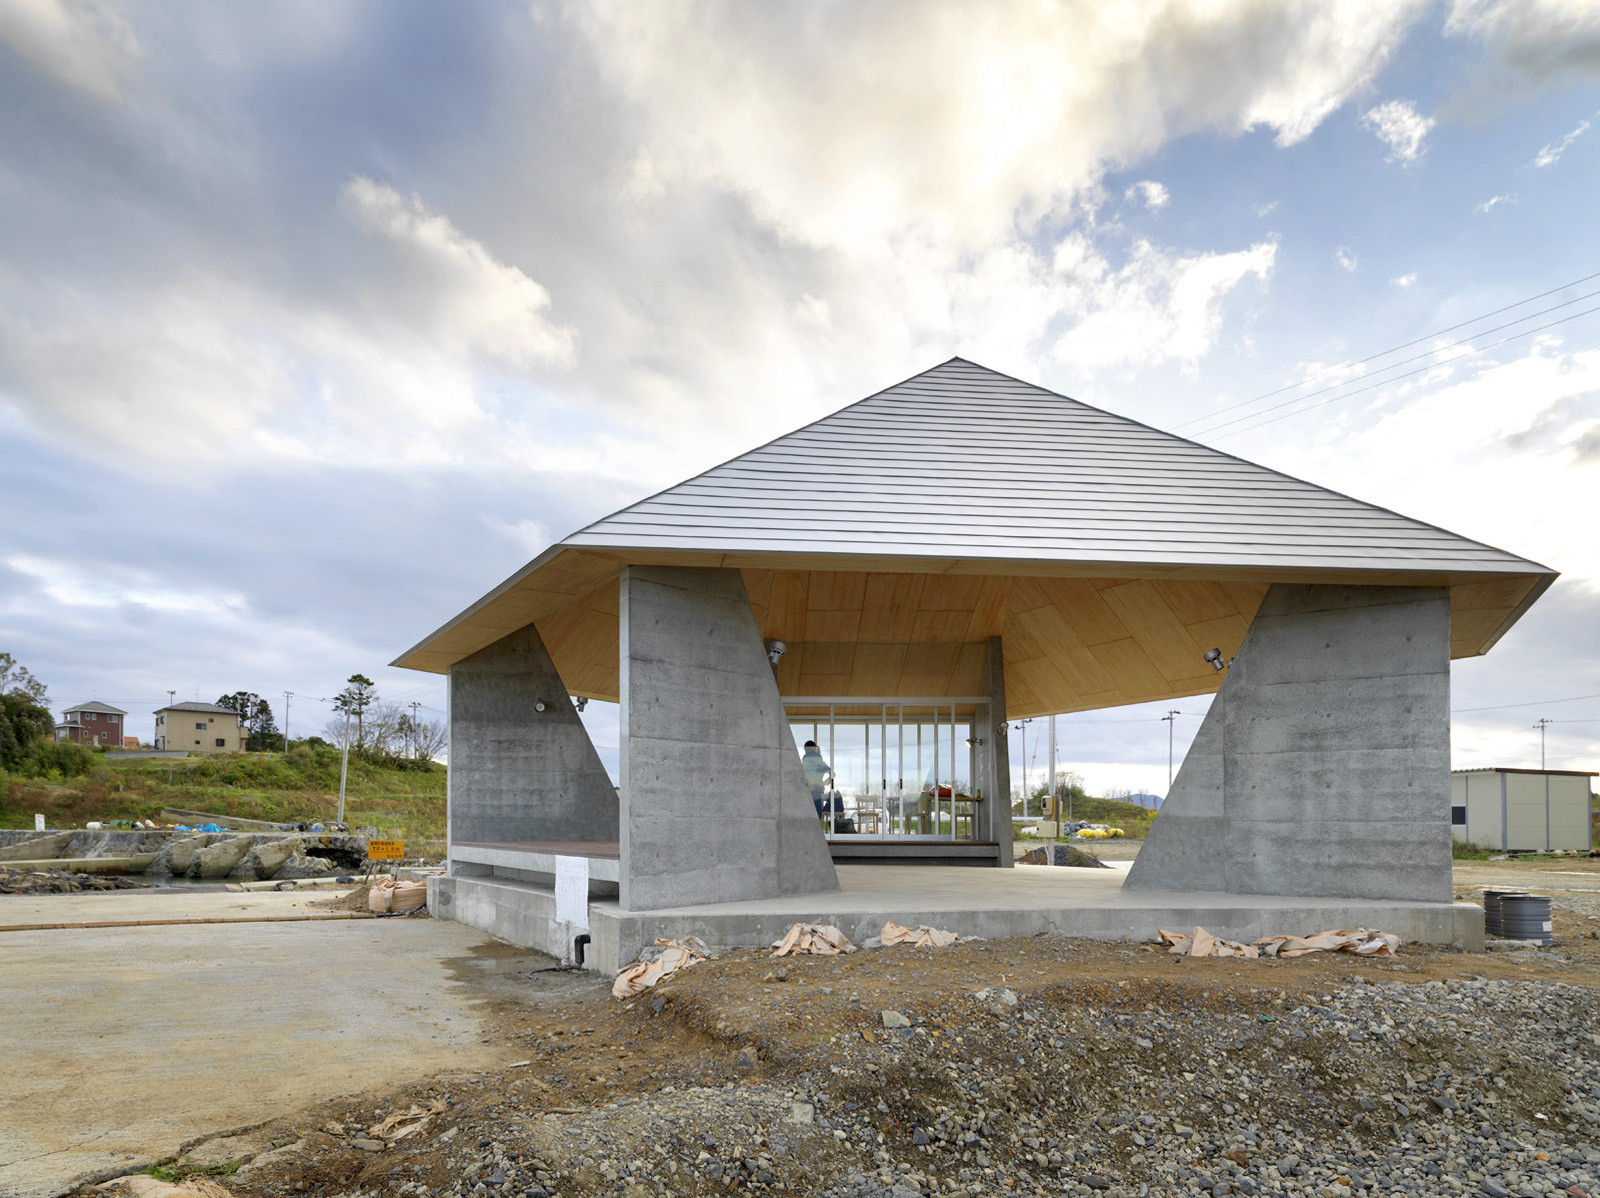 Home For All In Kesennuma / Zhaoyang Architects, © Jonathan Leijonhufvud